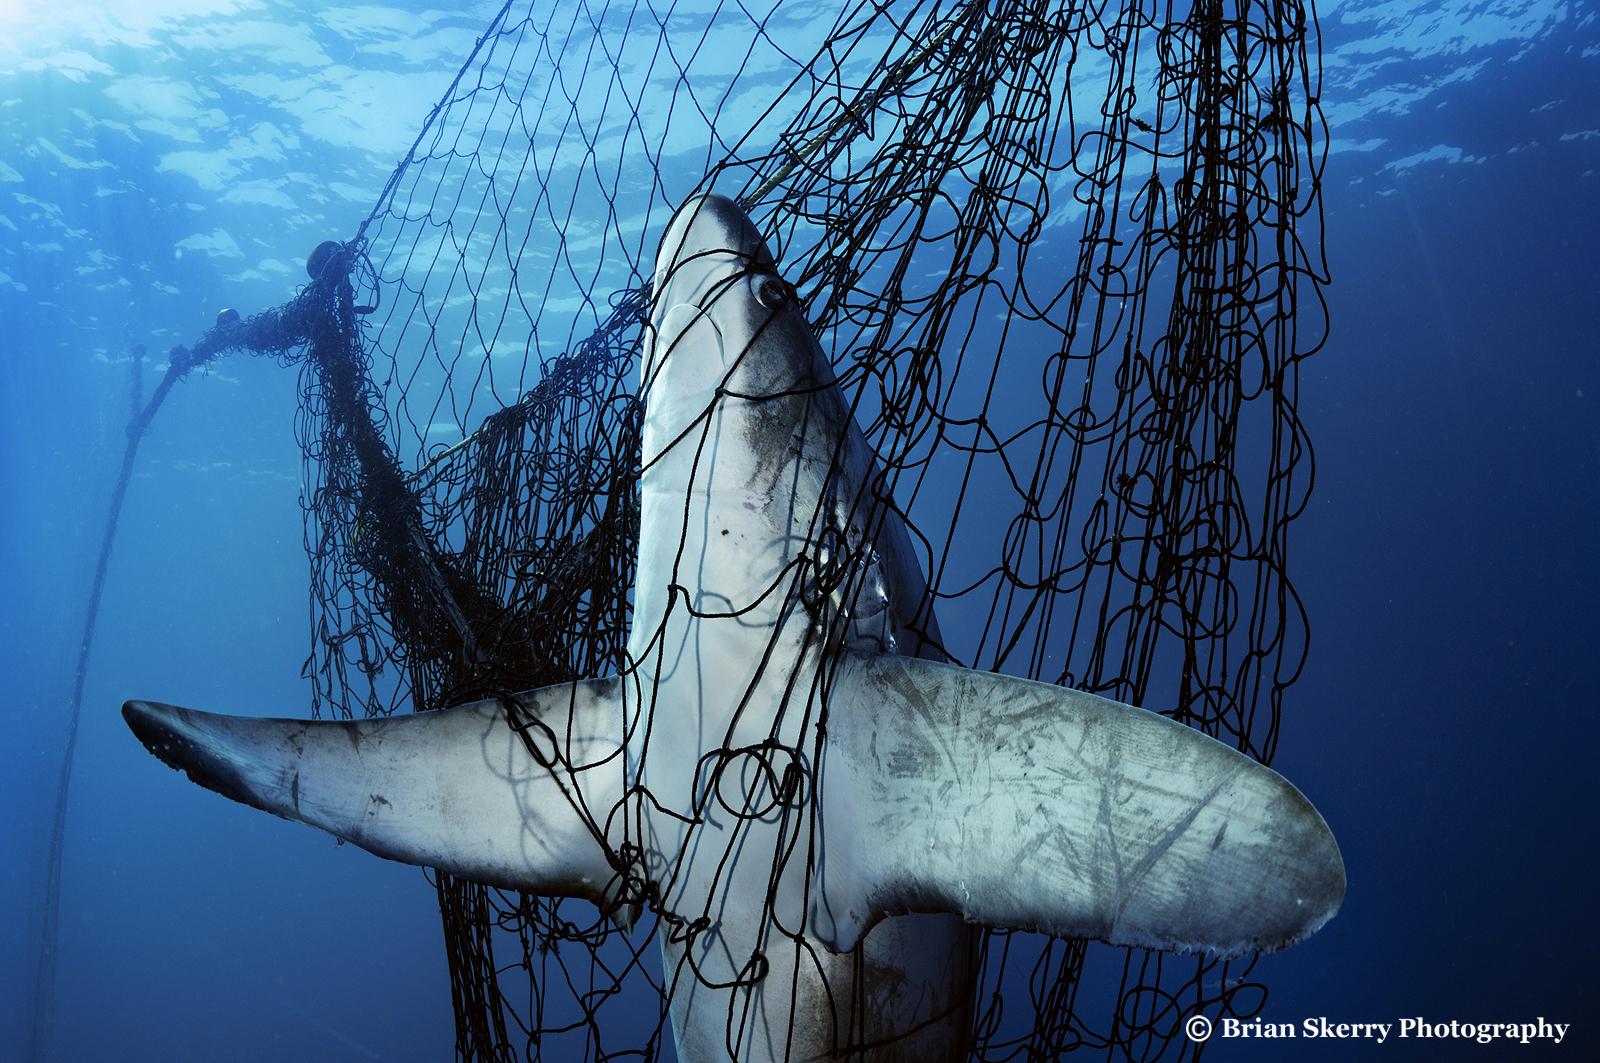 Thresher shark dead in gill net in Mexico's Gulf of California.